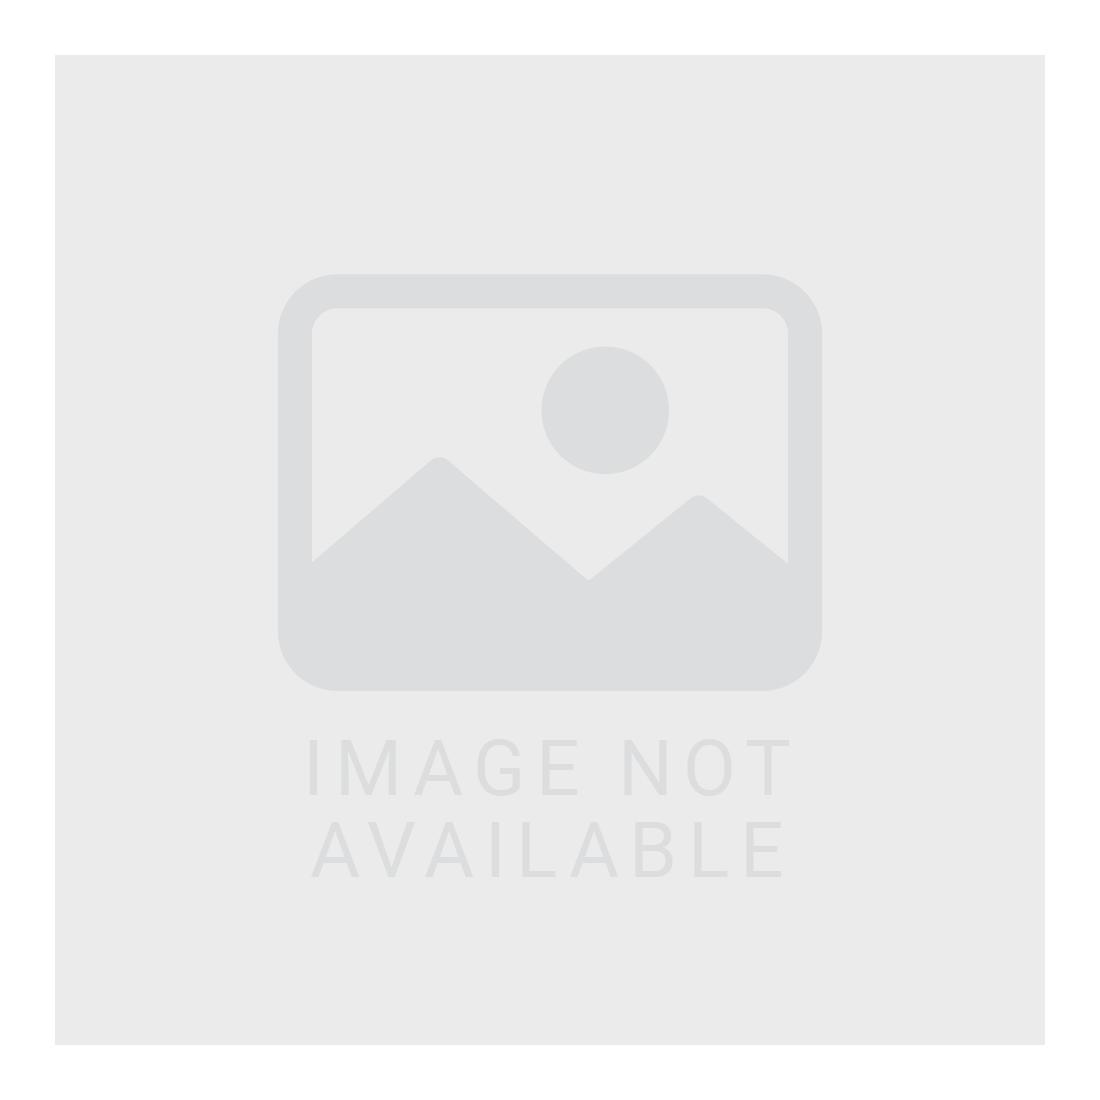 16 oz Ceramic Mug with Wood Lid